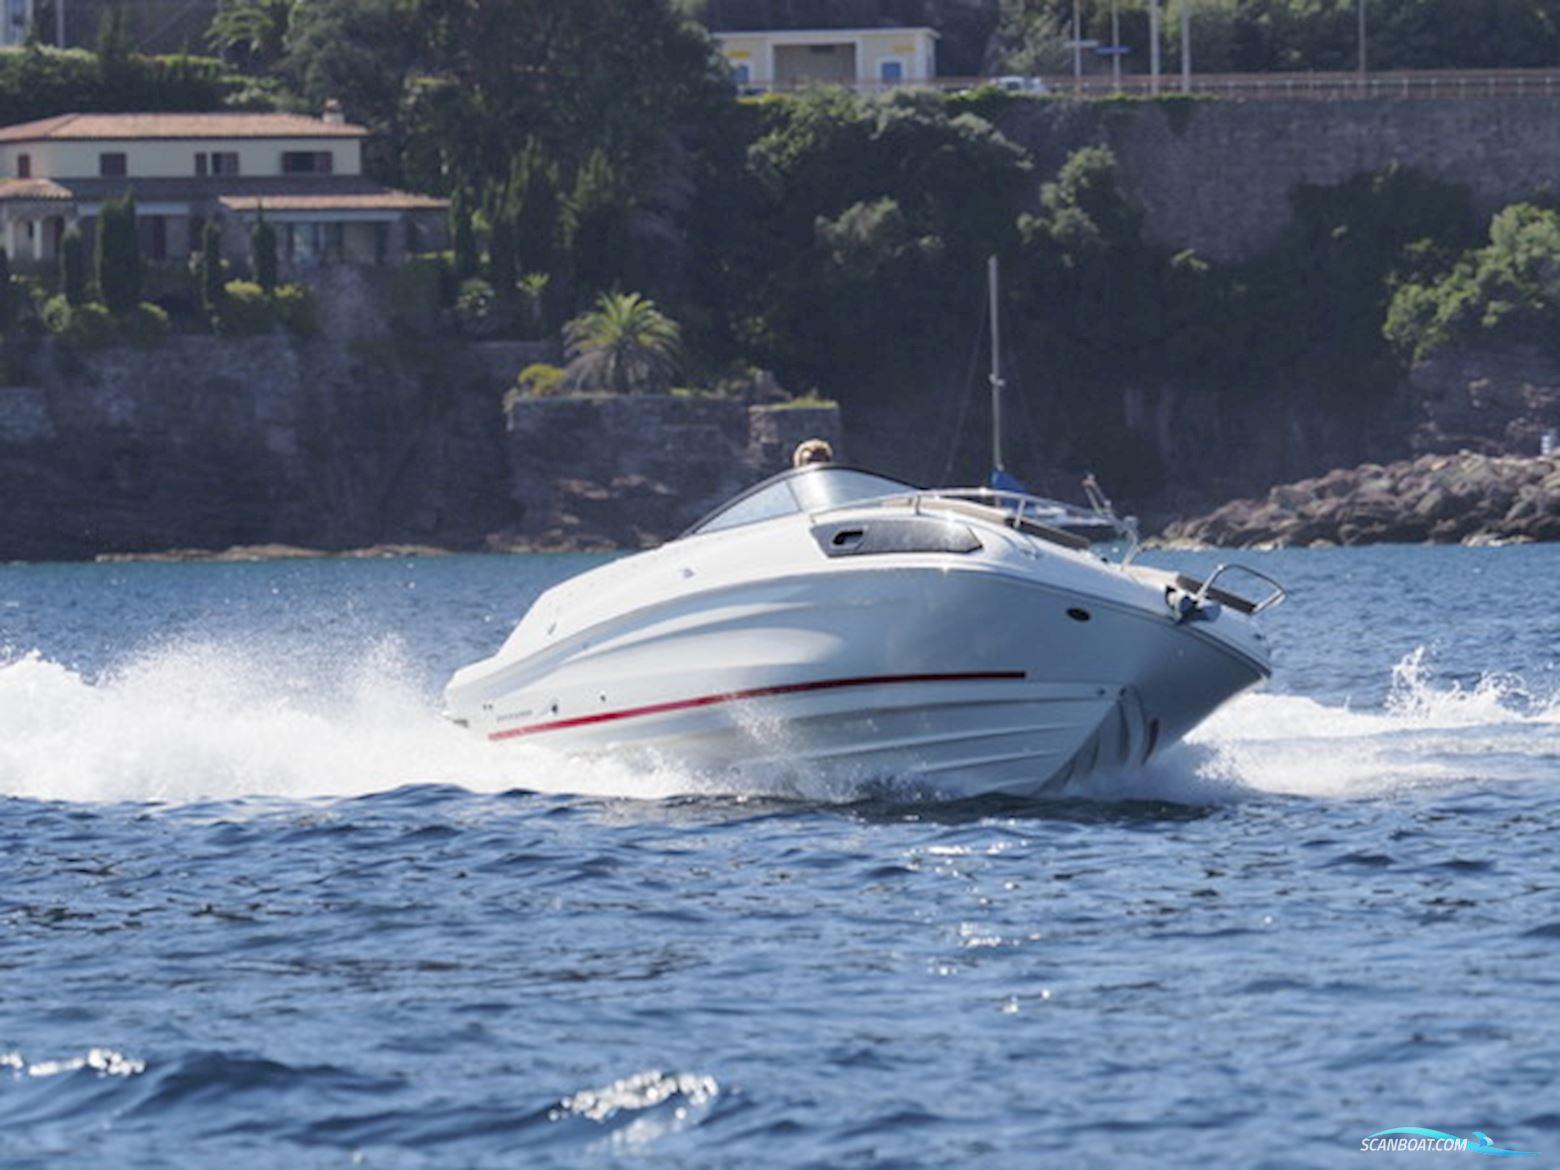 Bayliner VR6 Cuddy Med Mercruiser 4.5L Mpi 250hk, Alpha One